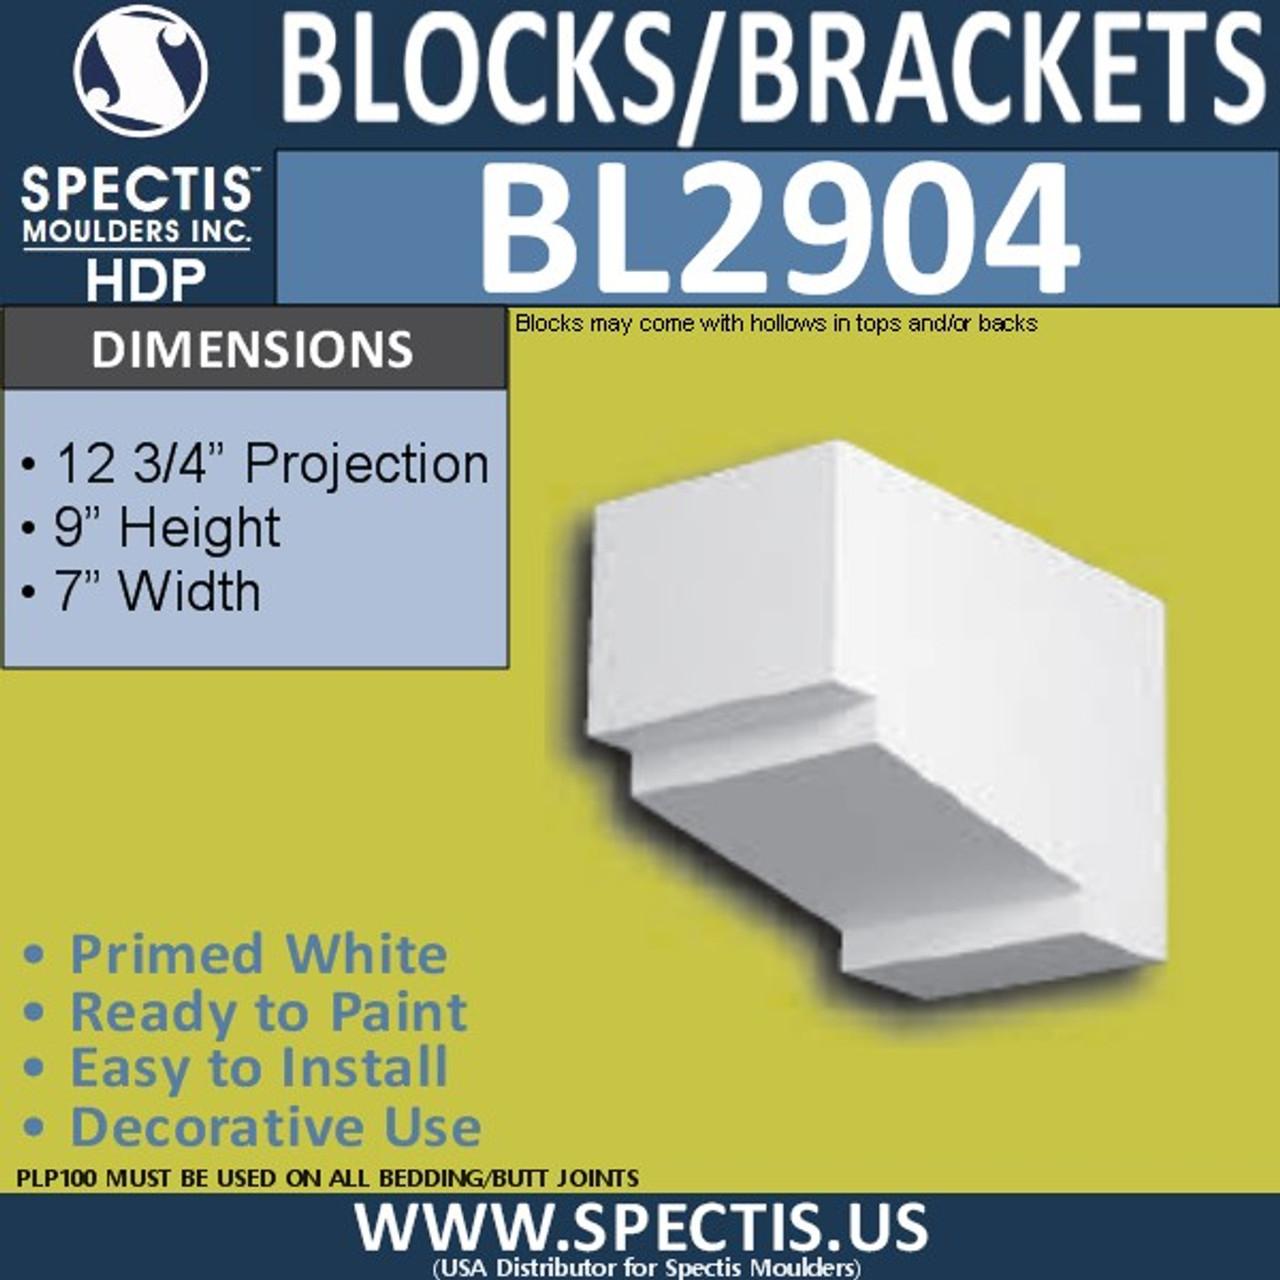 "BL2904 Eave Block or Bracket 7""W x 9""H x 12.75"" P"